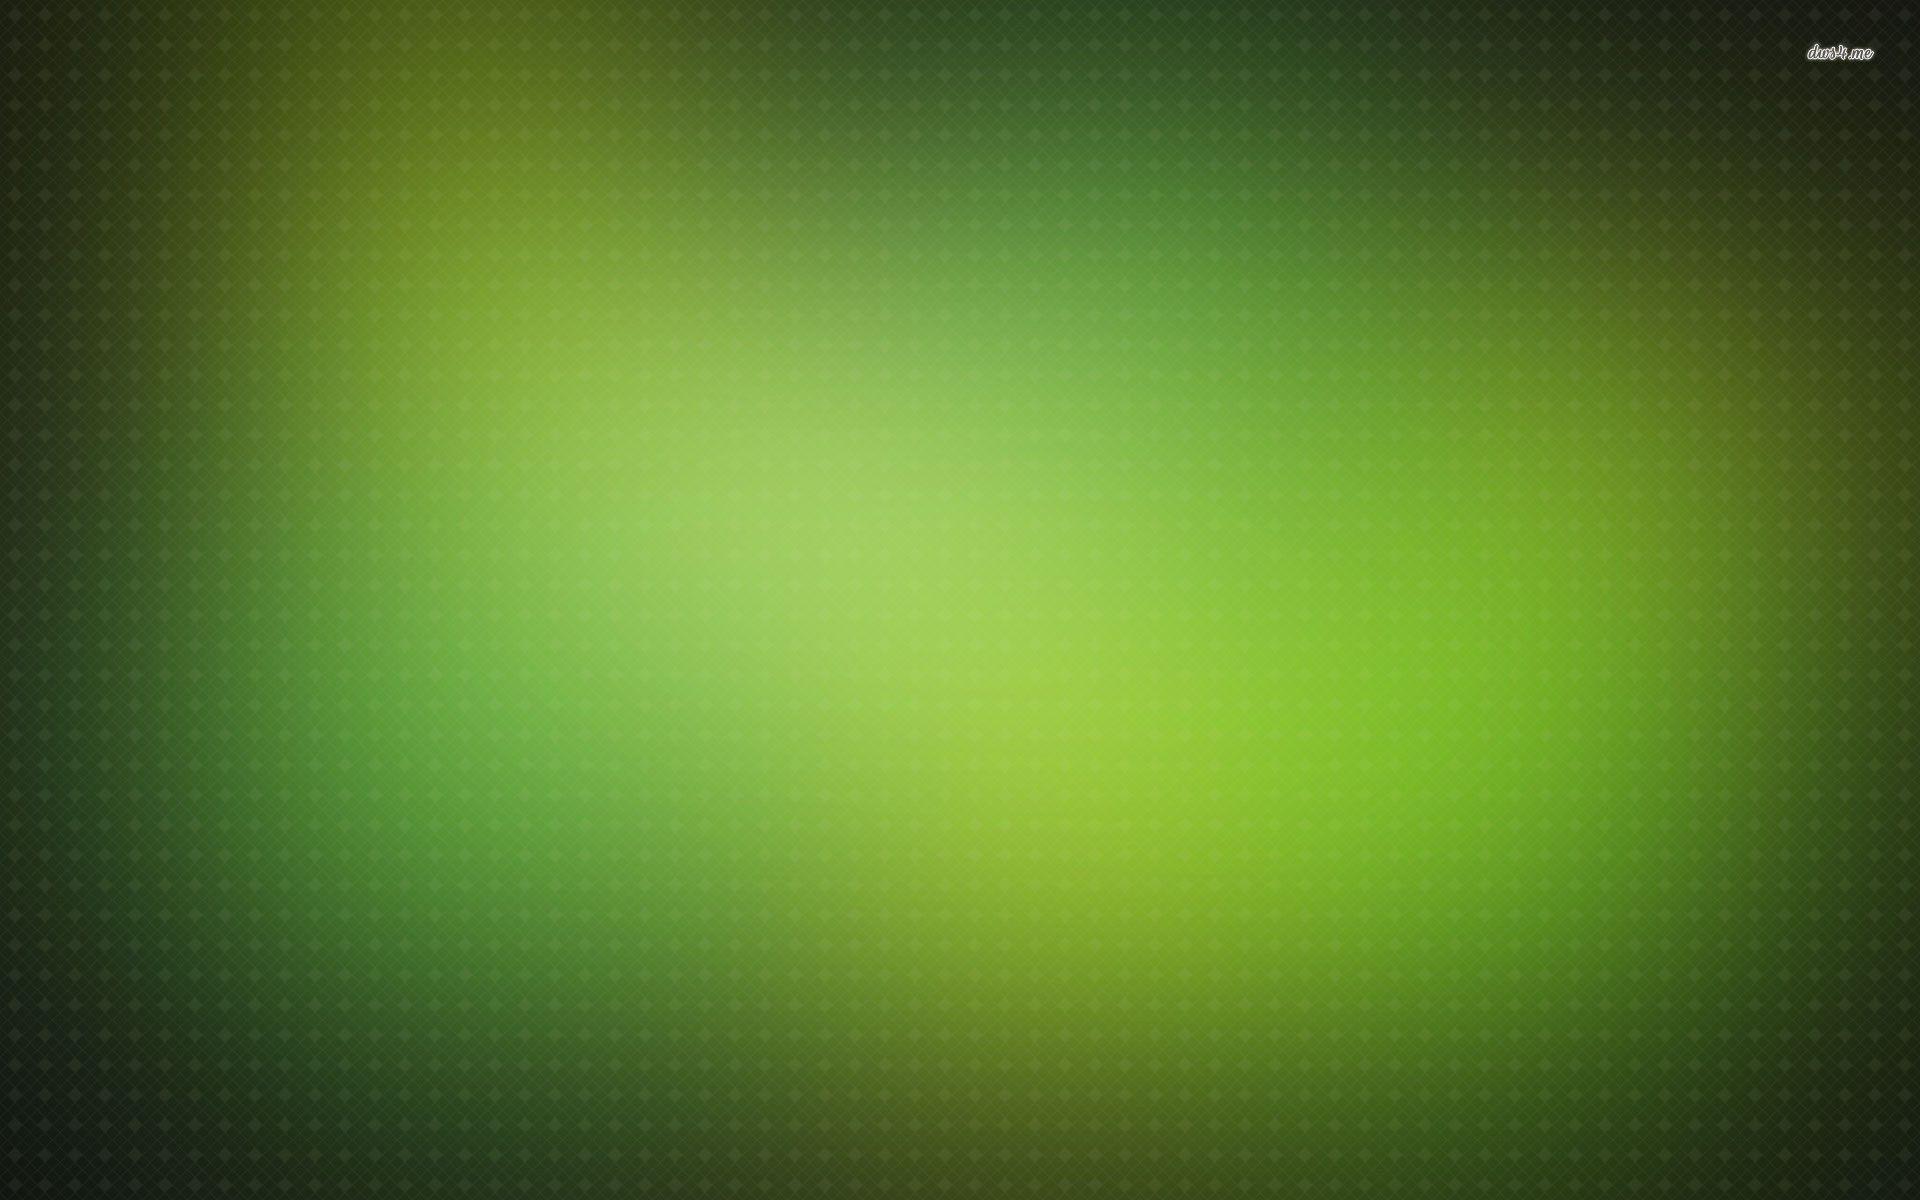 Green gradient over pattern HD wallpaper Green gradient